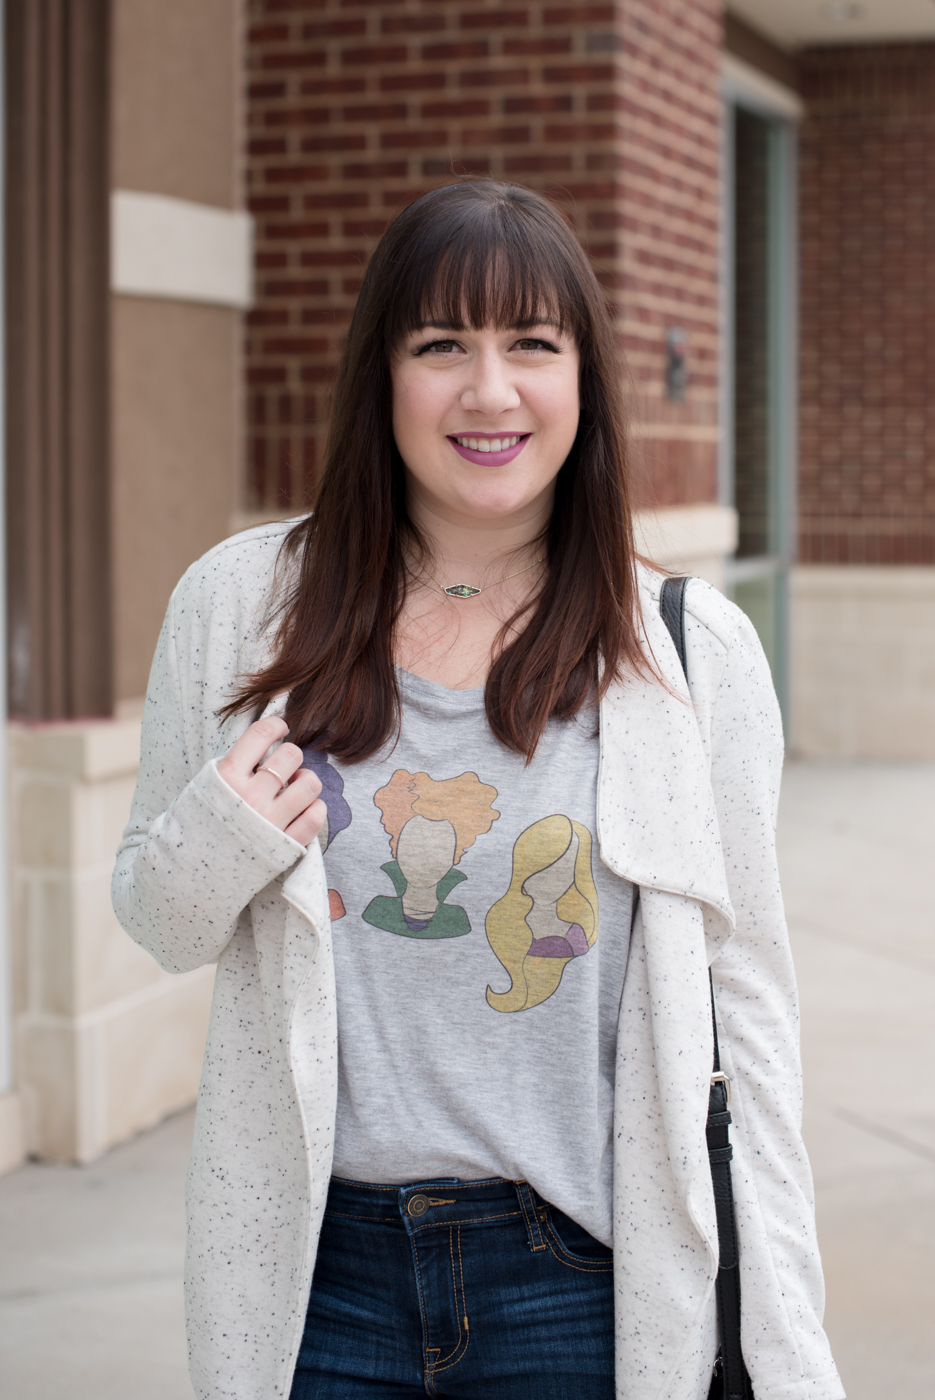 Halloween Graphic Tee, Sanderson Sisters Shirt, Hocus Pocus Shirt